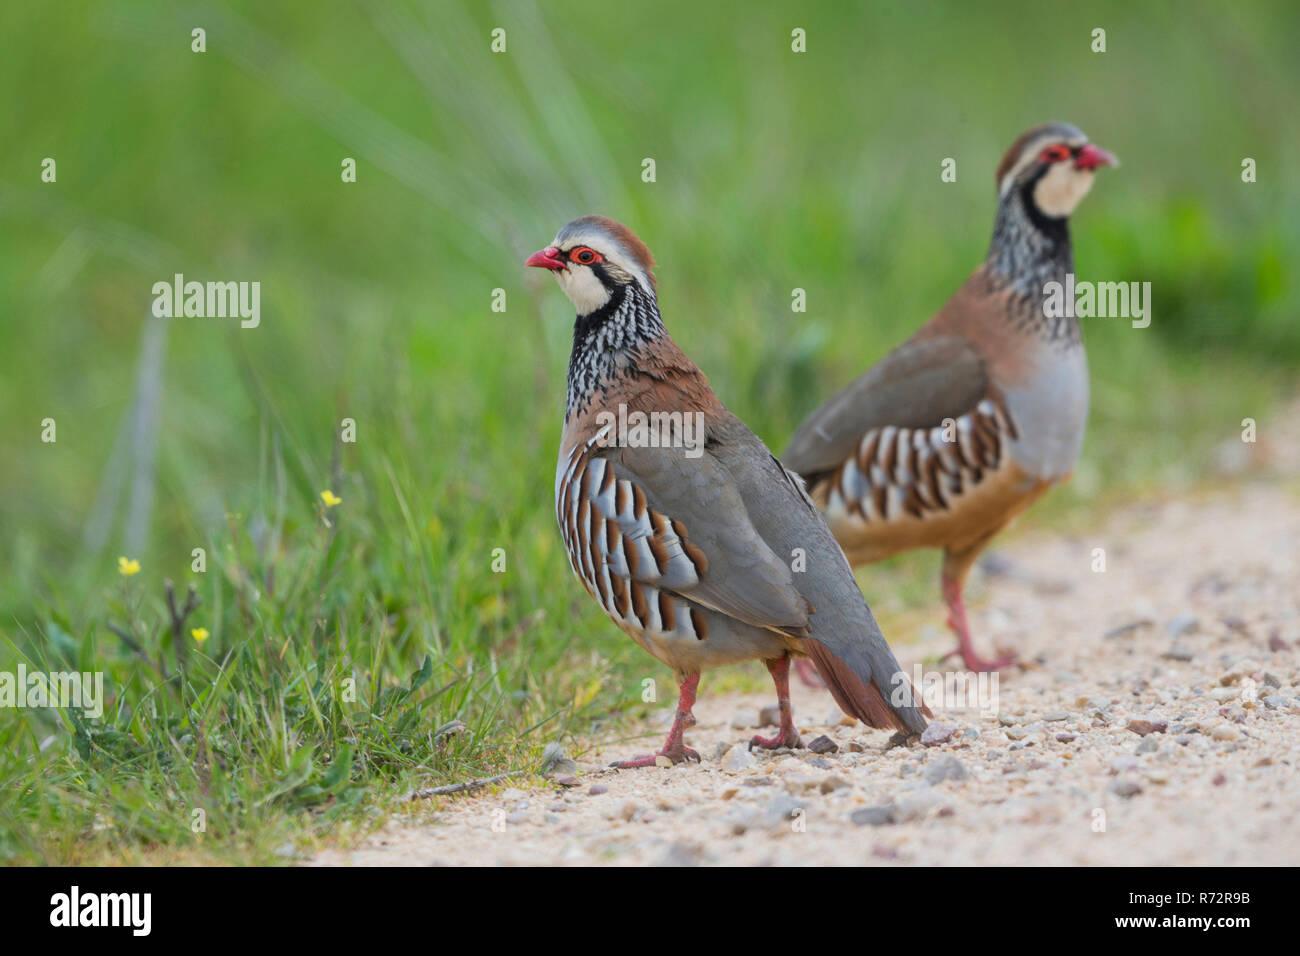 Red legged partridge, Spain, (Alectoris rufa) - Stock Image